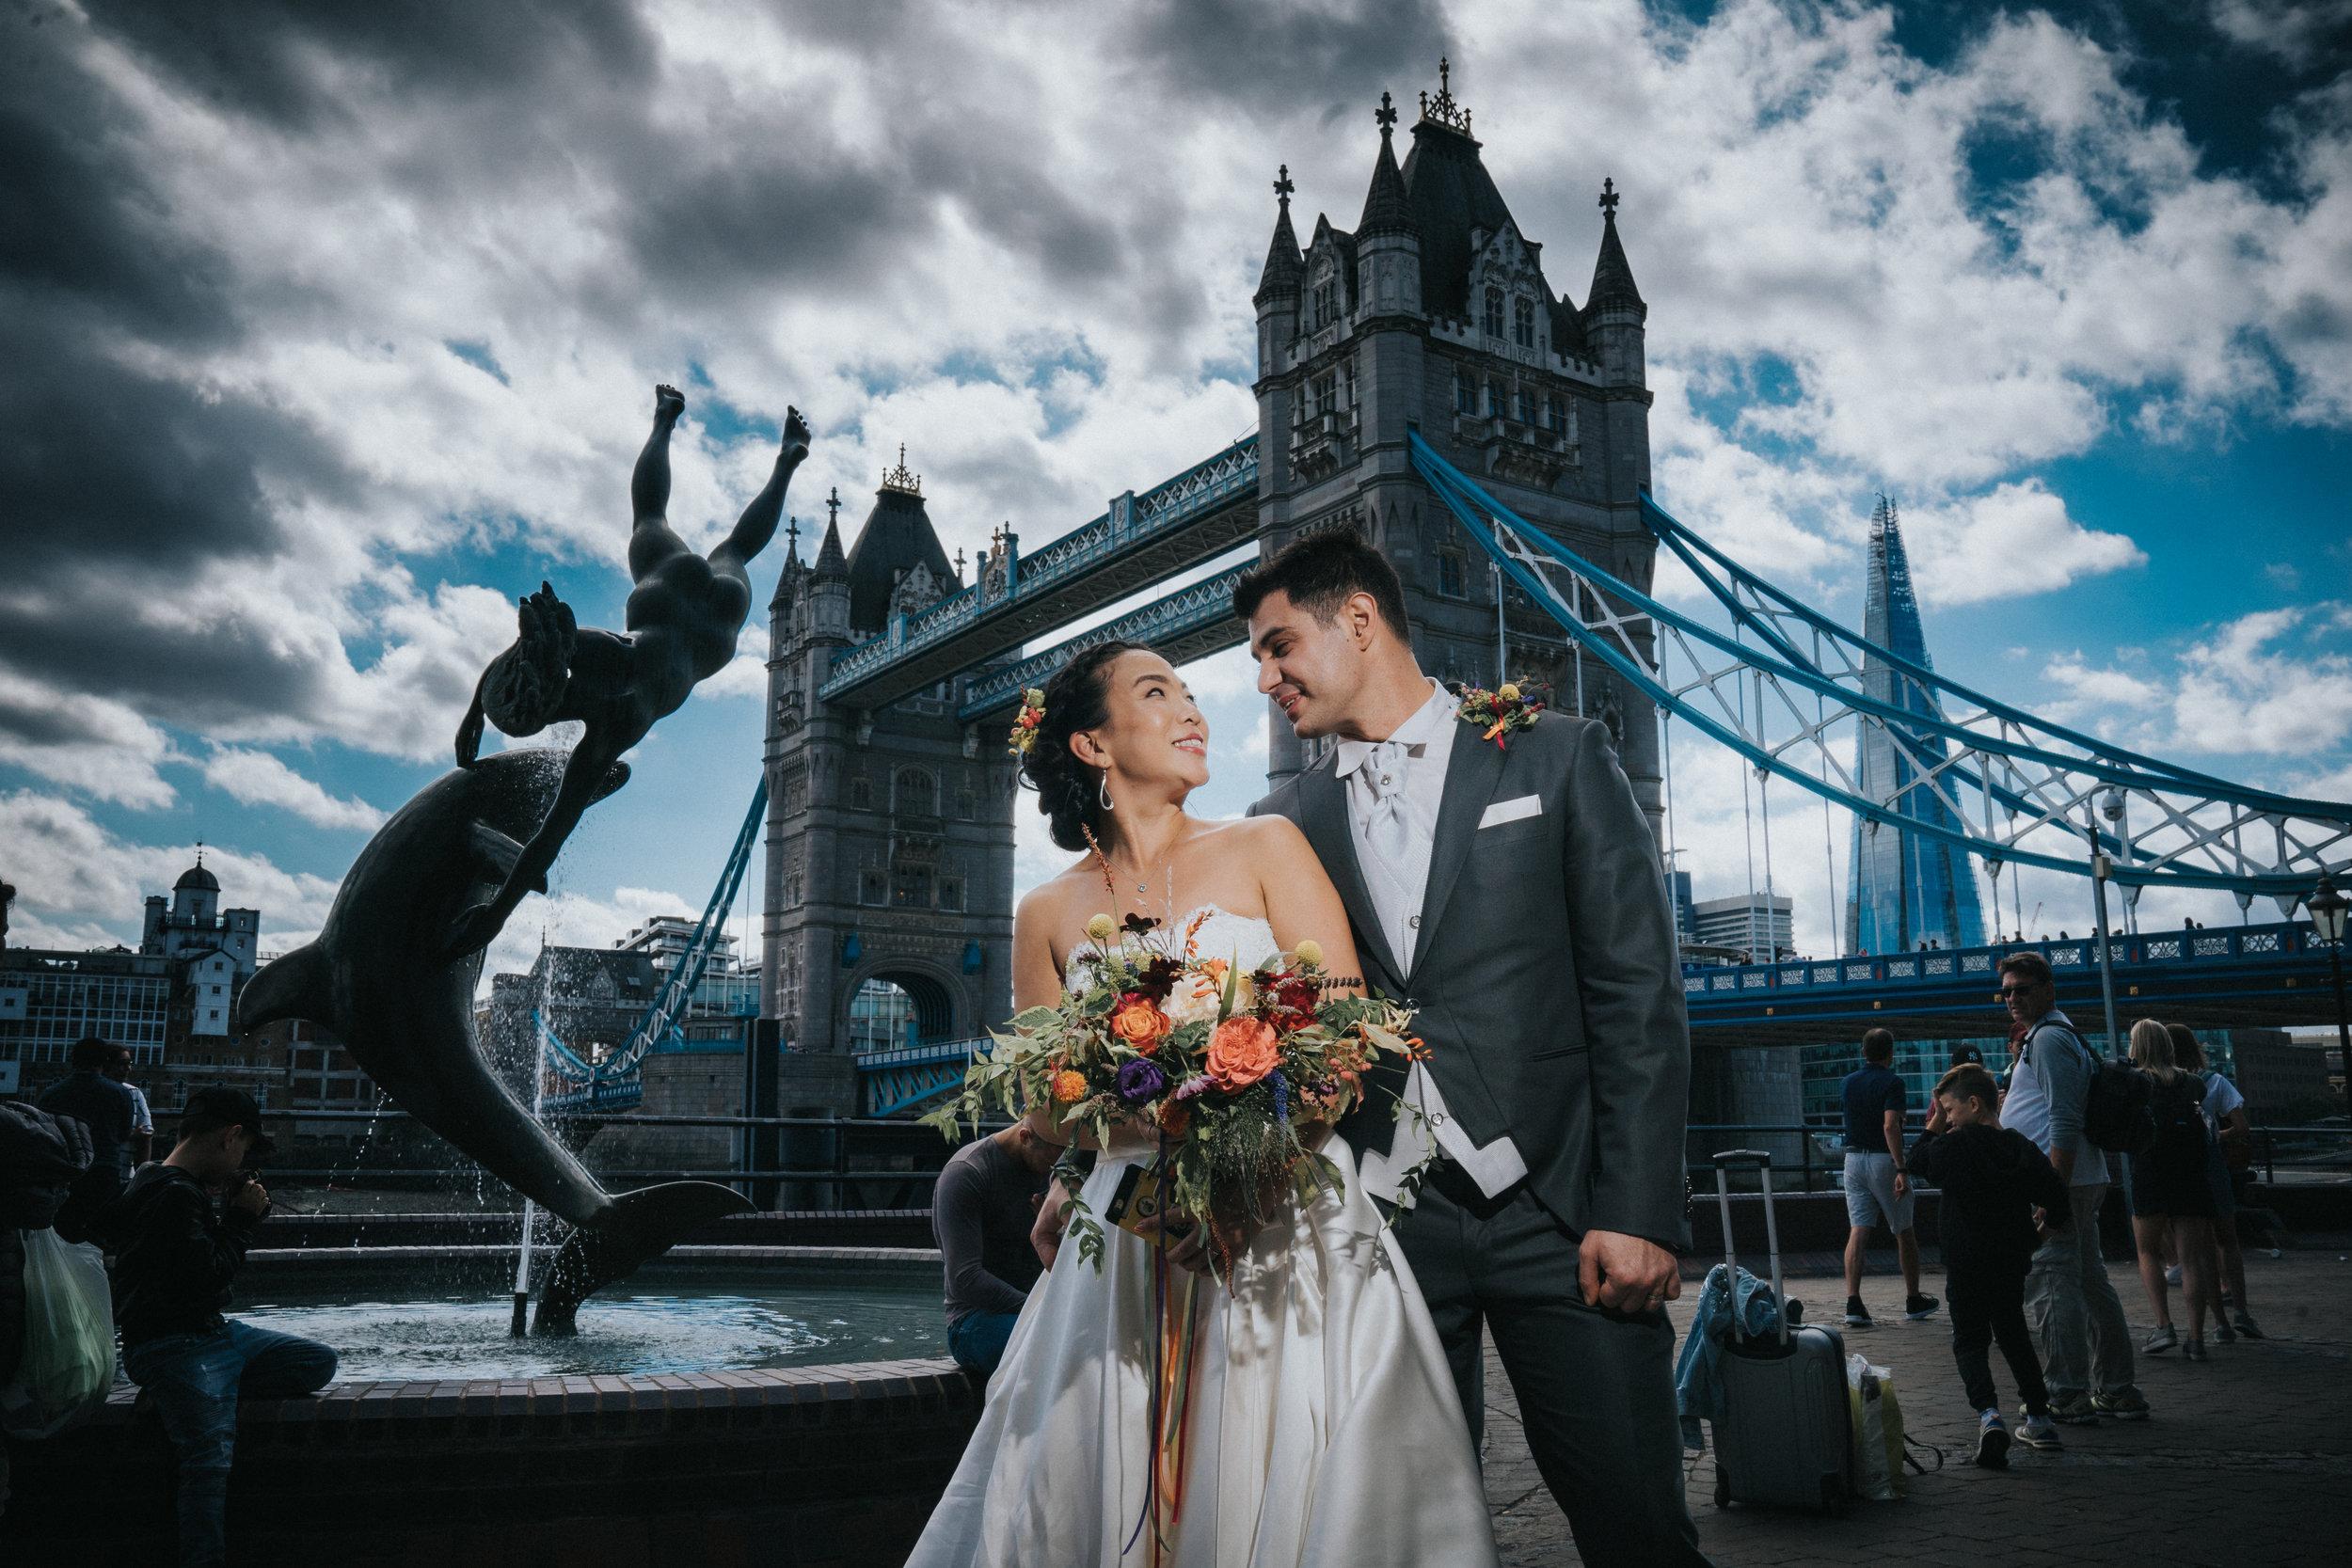 river-rooms-tower-bridge-london-stpauls-mondrian-hotel-wedding-photography-videography-53